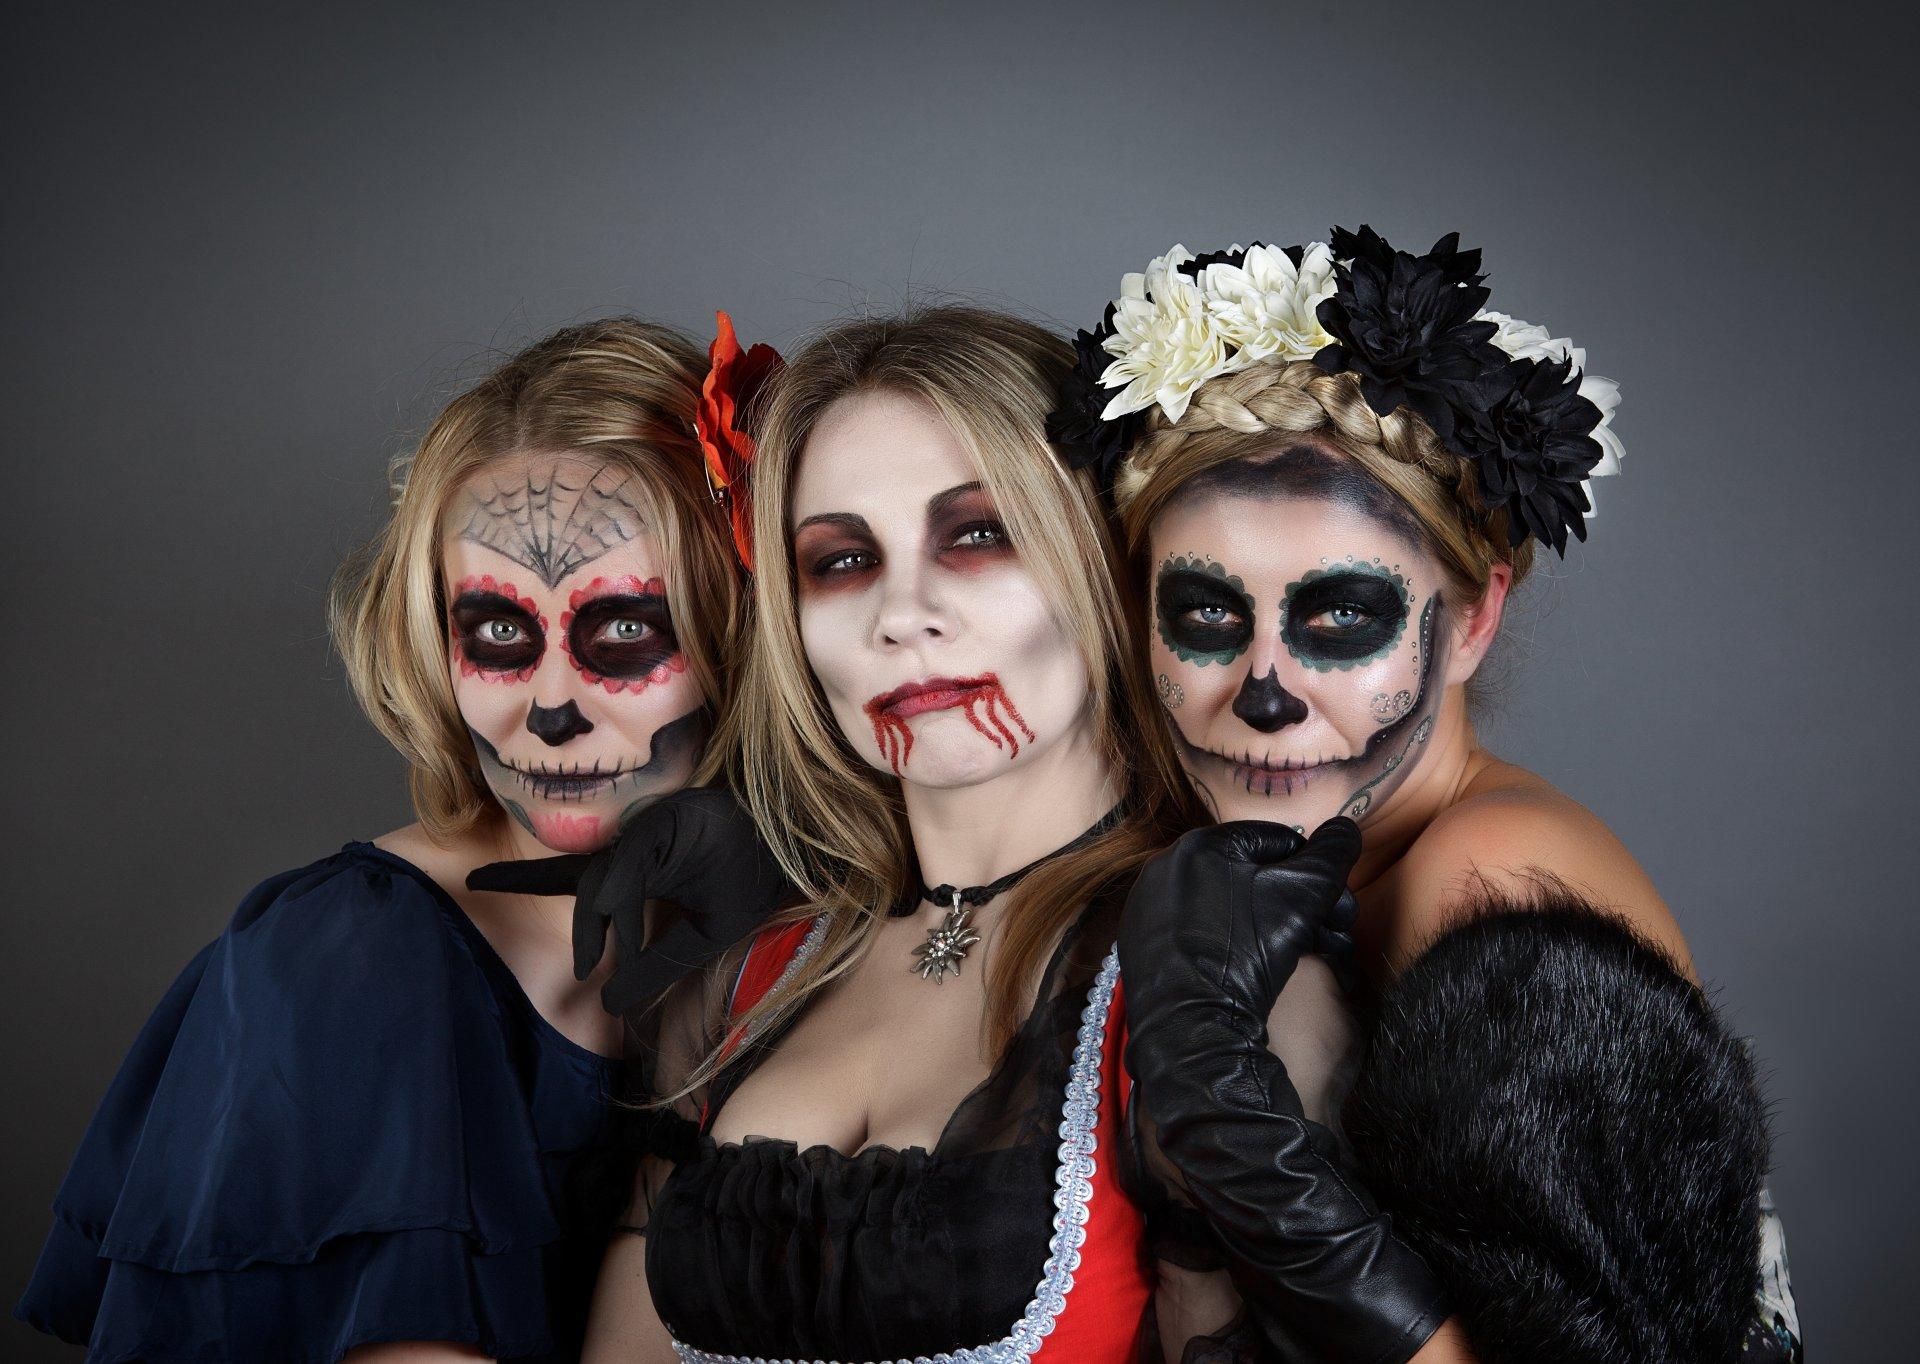 фото на хэллоуин куда